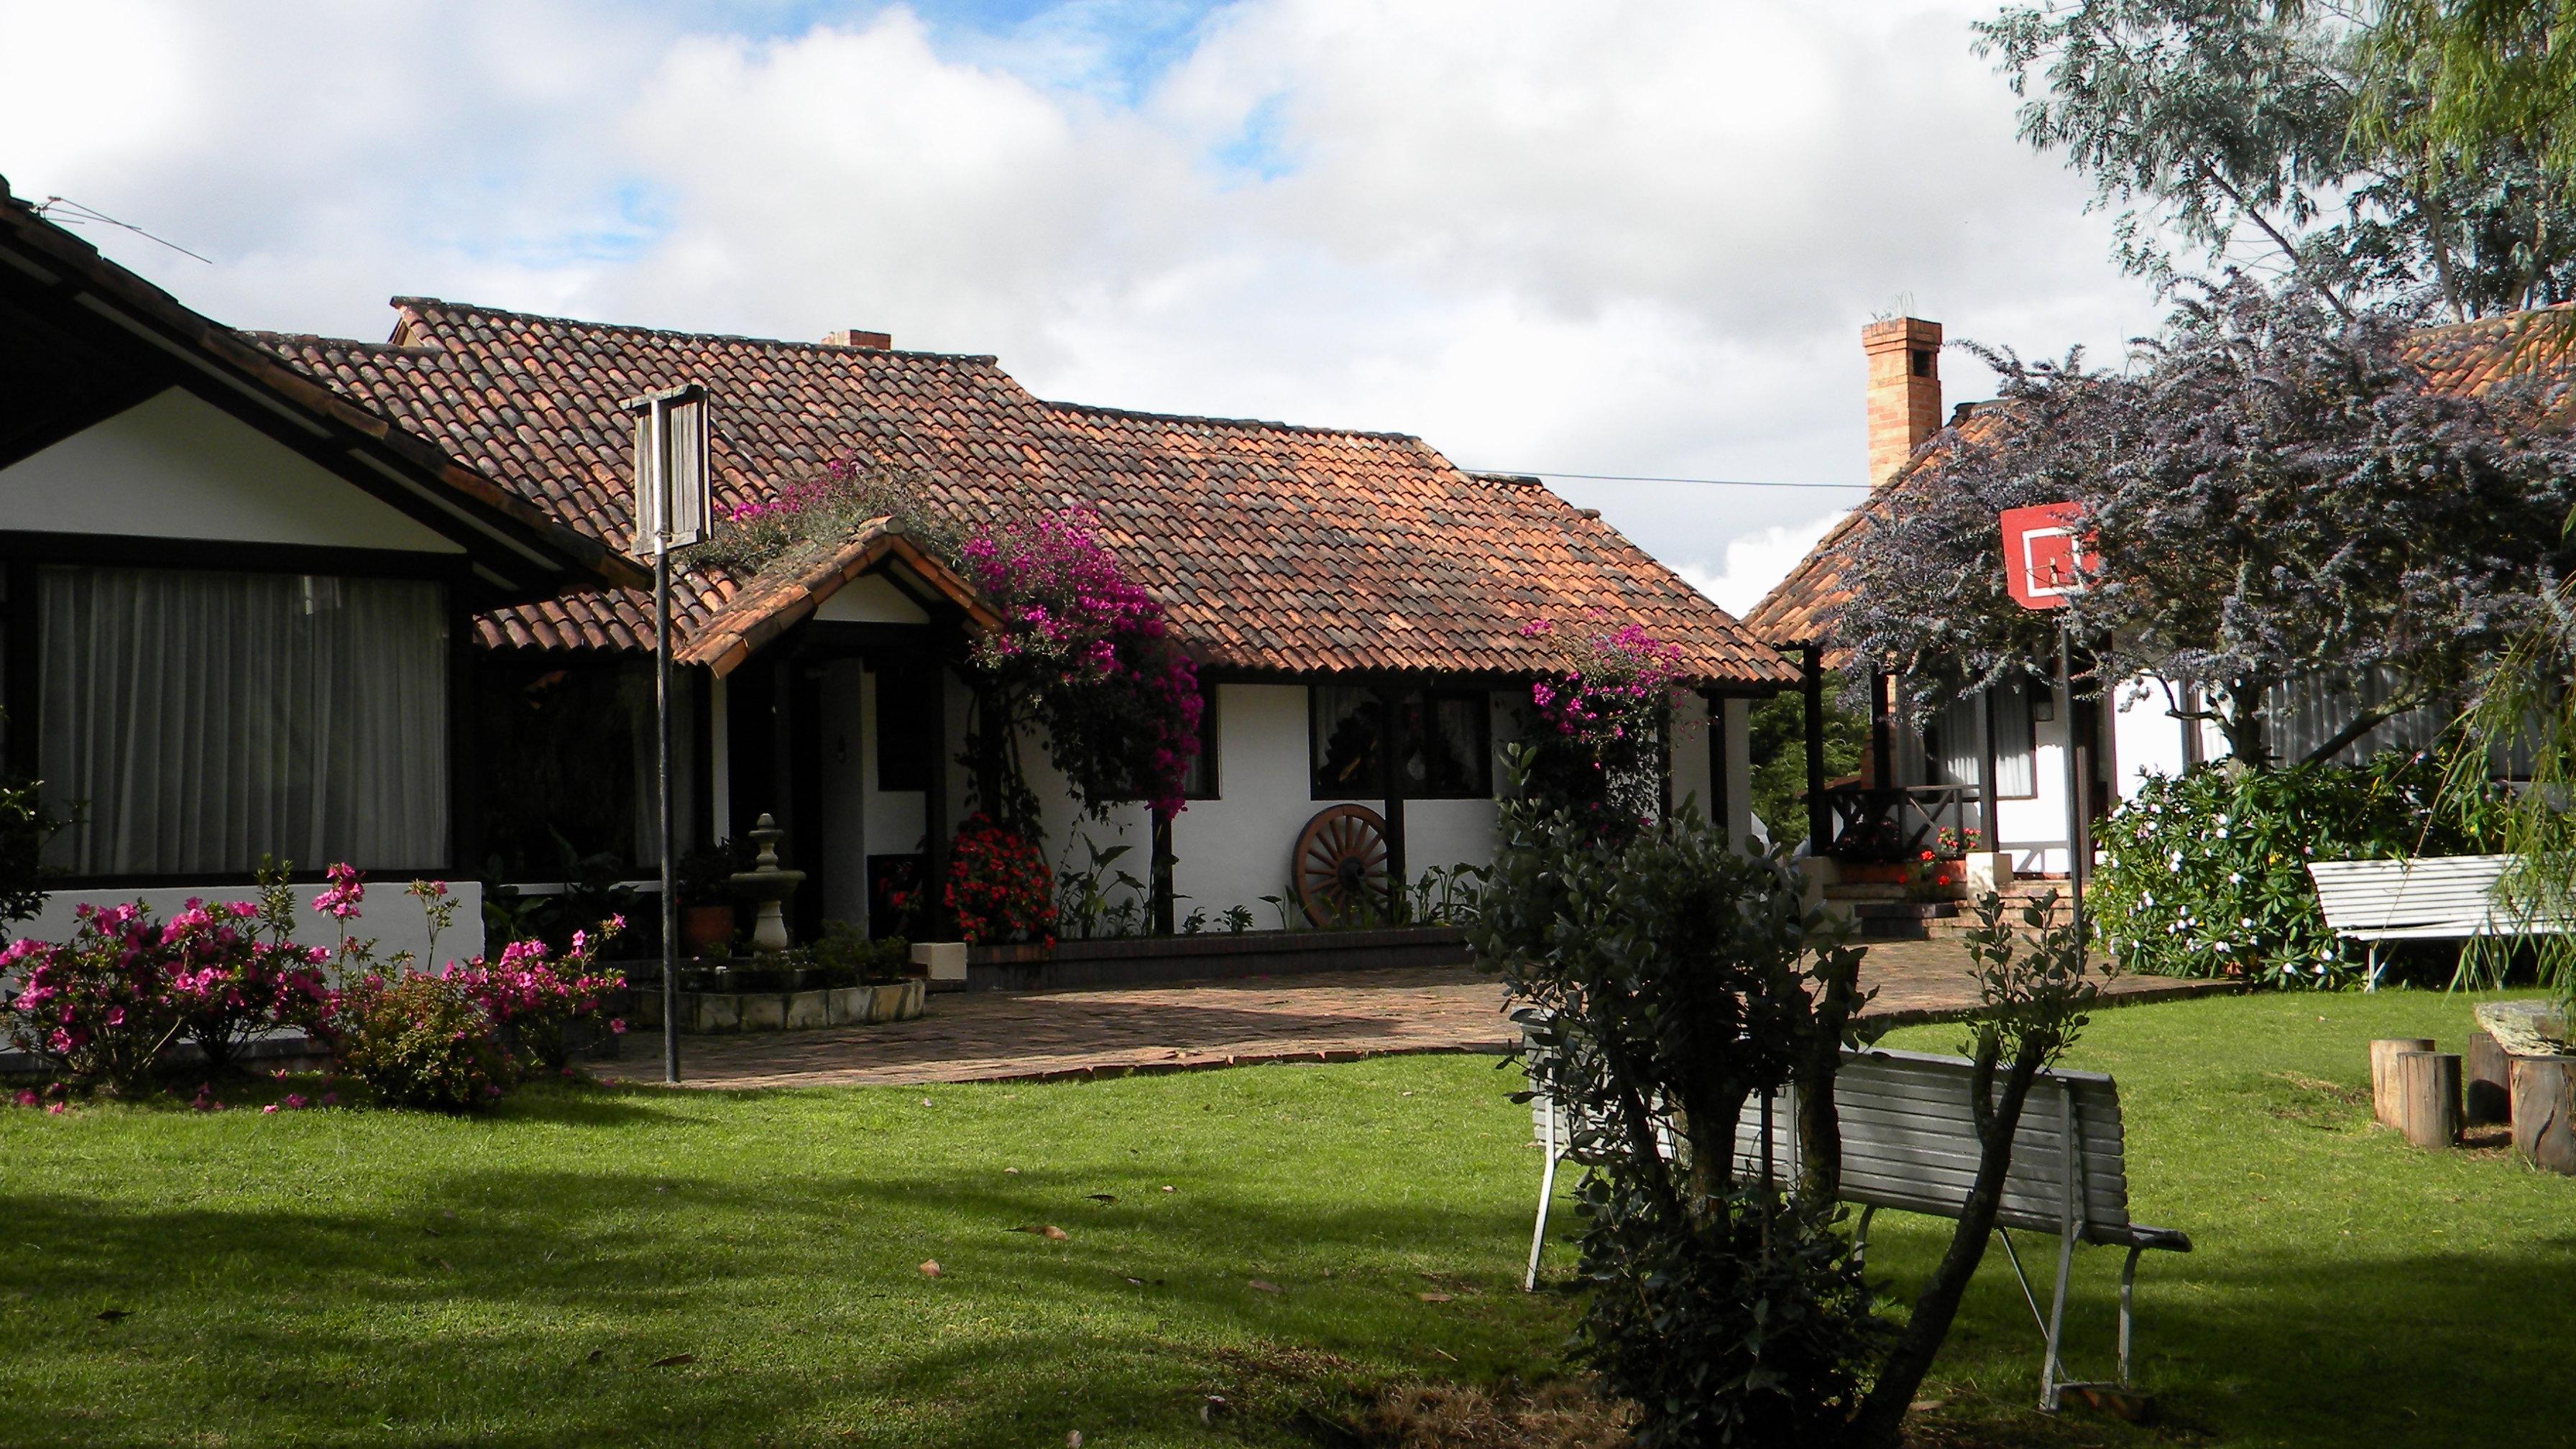 Yopal casa